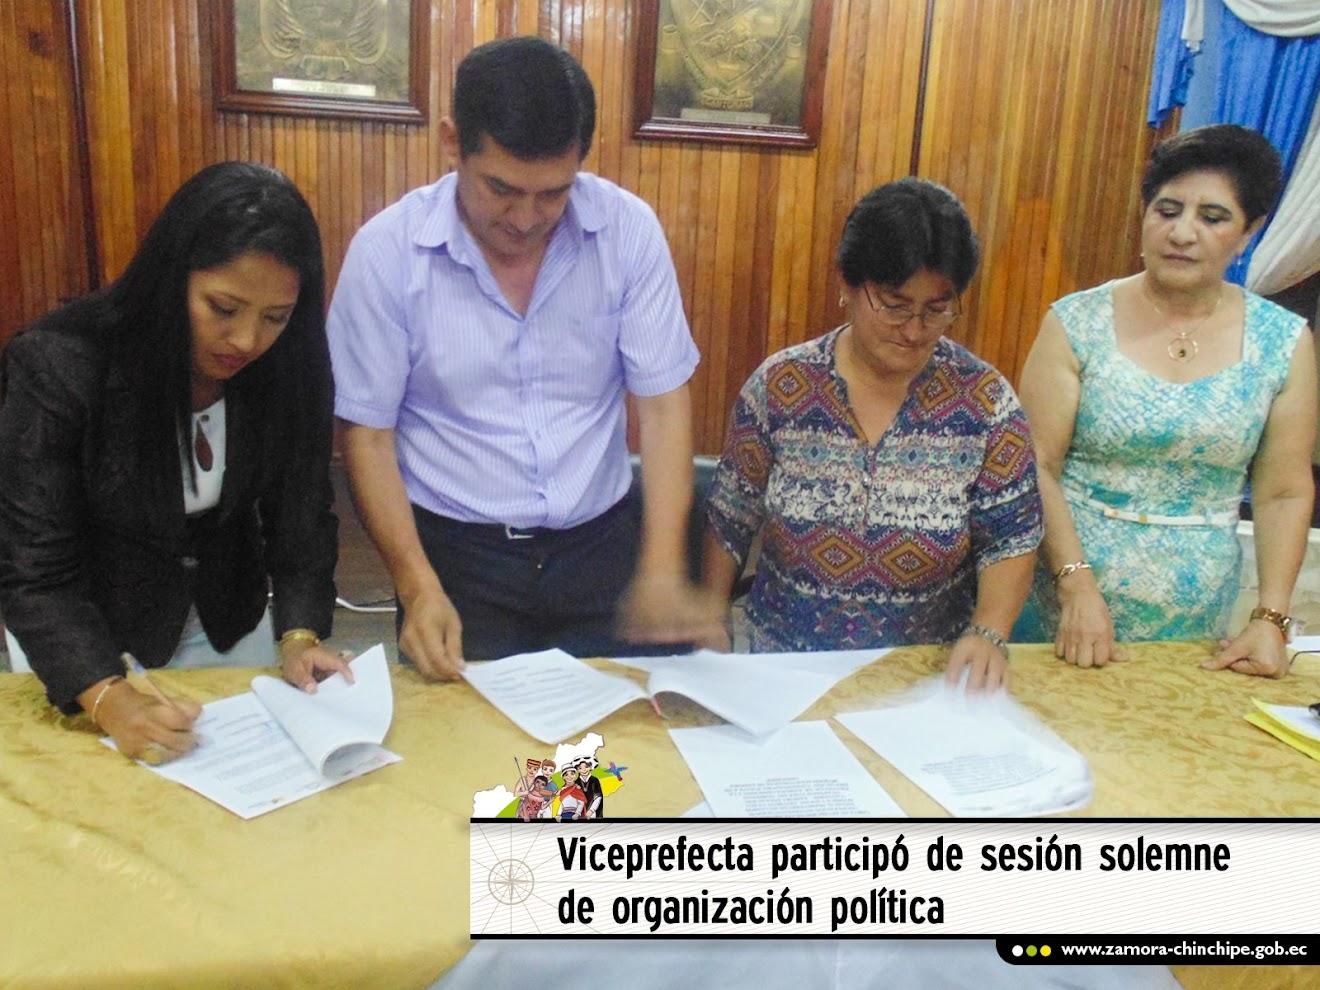 VICEPREFECTA PARTICIPÓ DE SESIÓN SOLEMNE DE ORGANIZACIÓN POLÍTICA